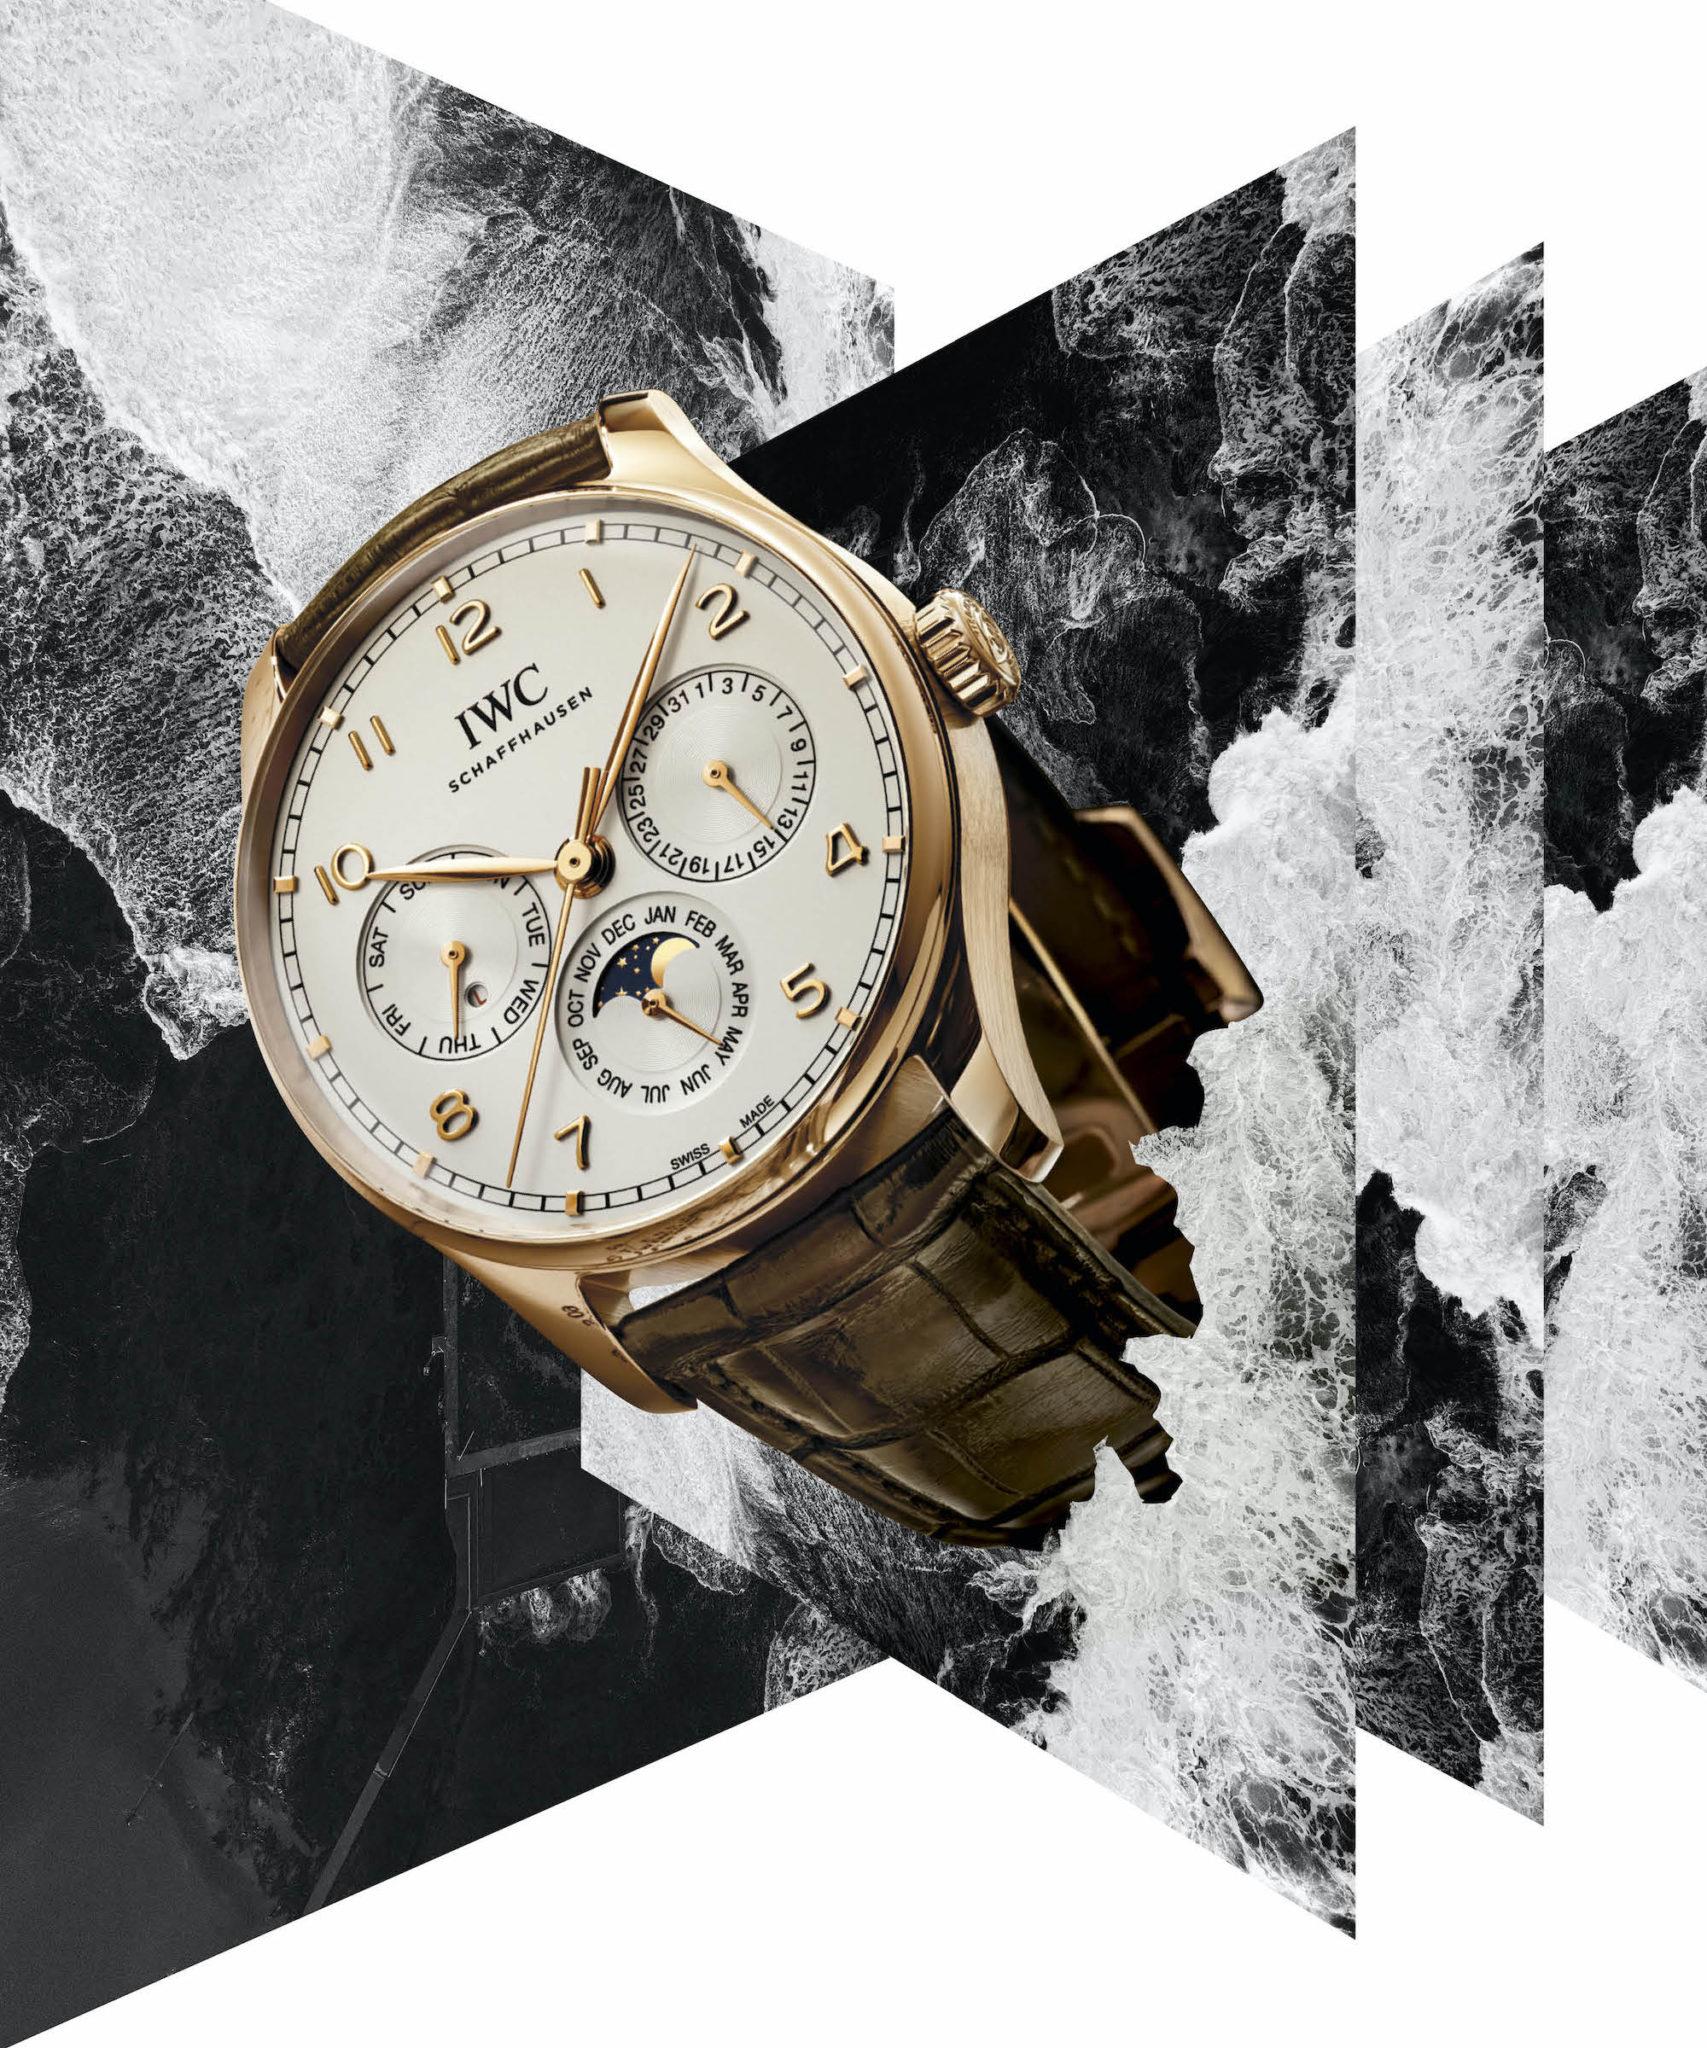 perpetual watch